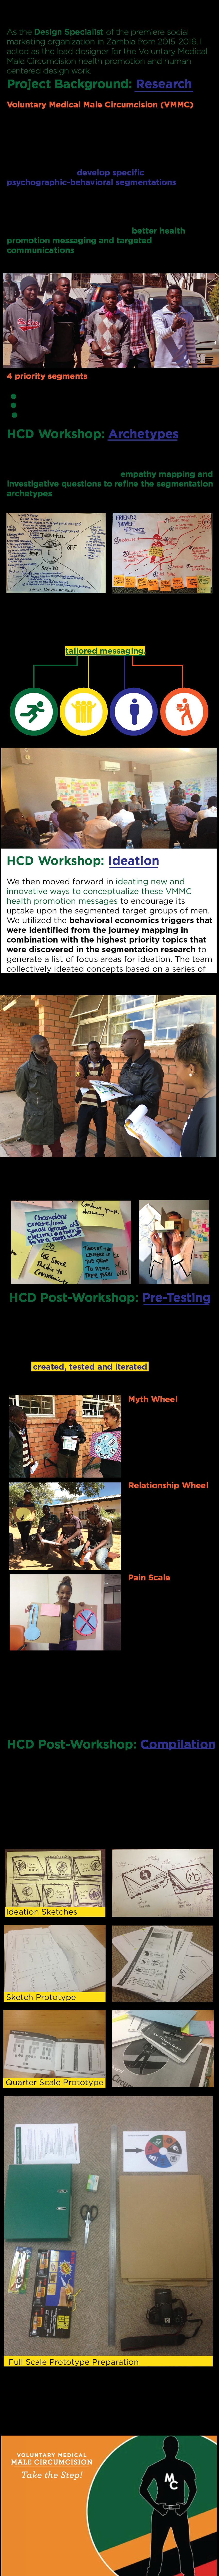 HCD_VMMC_Portfolio2.png